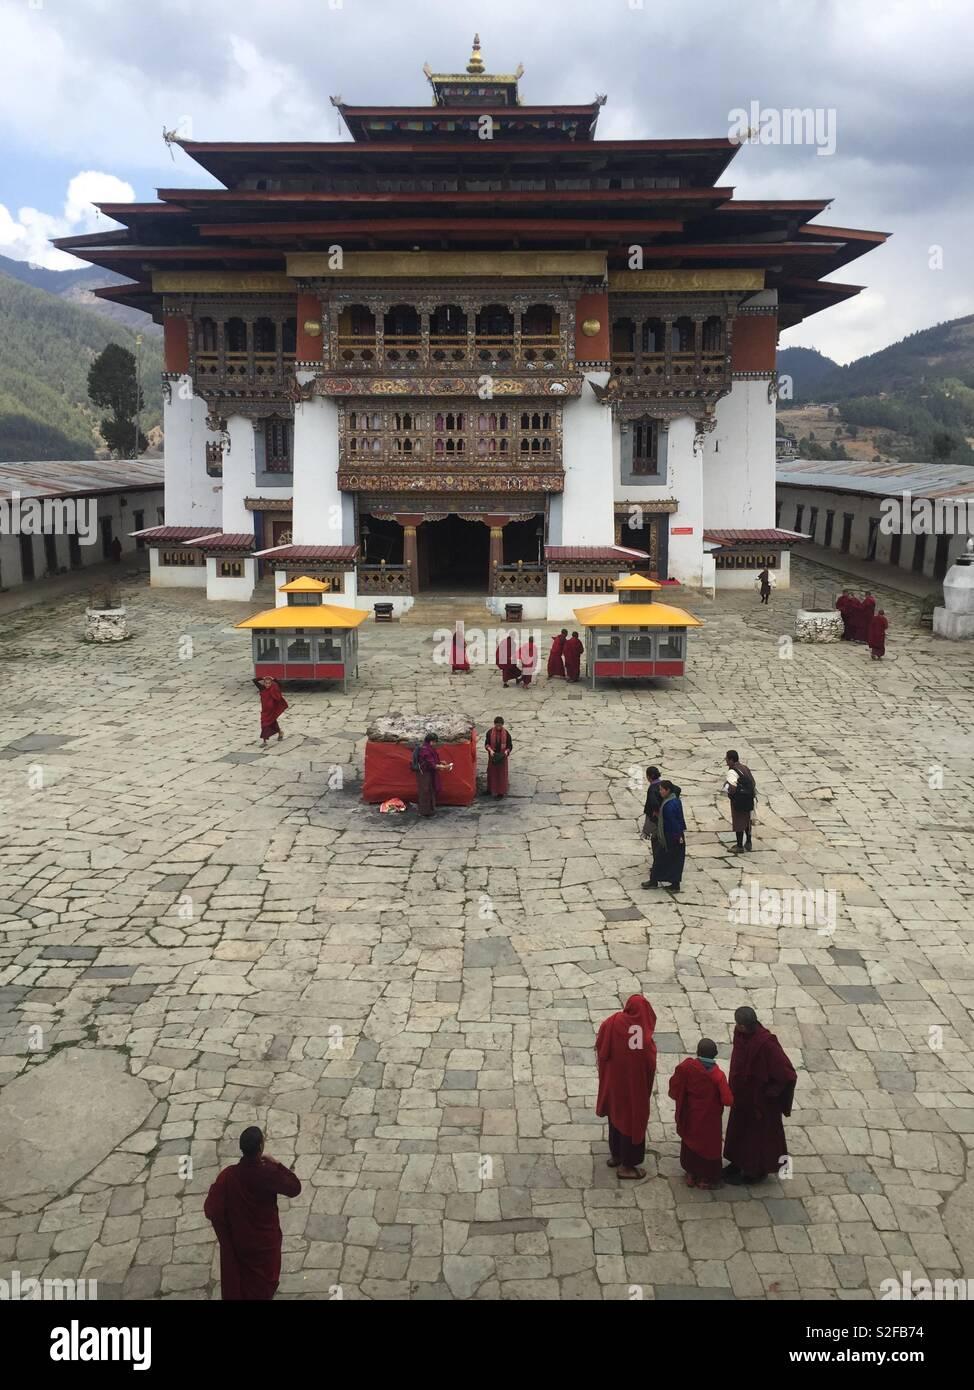 Buddhist monastery in Phobjika Valley, Central Bhutan - Stock Image